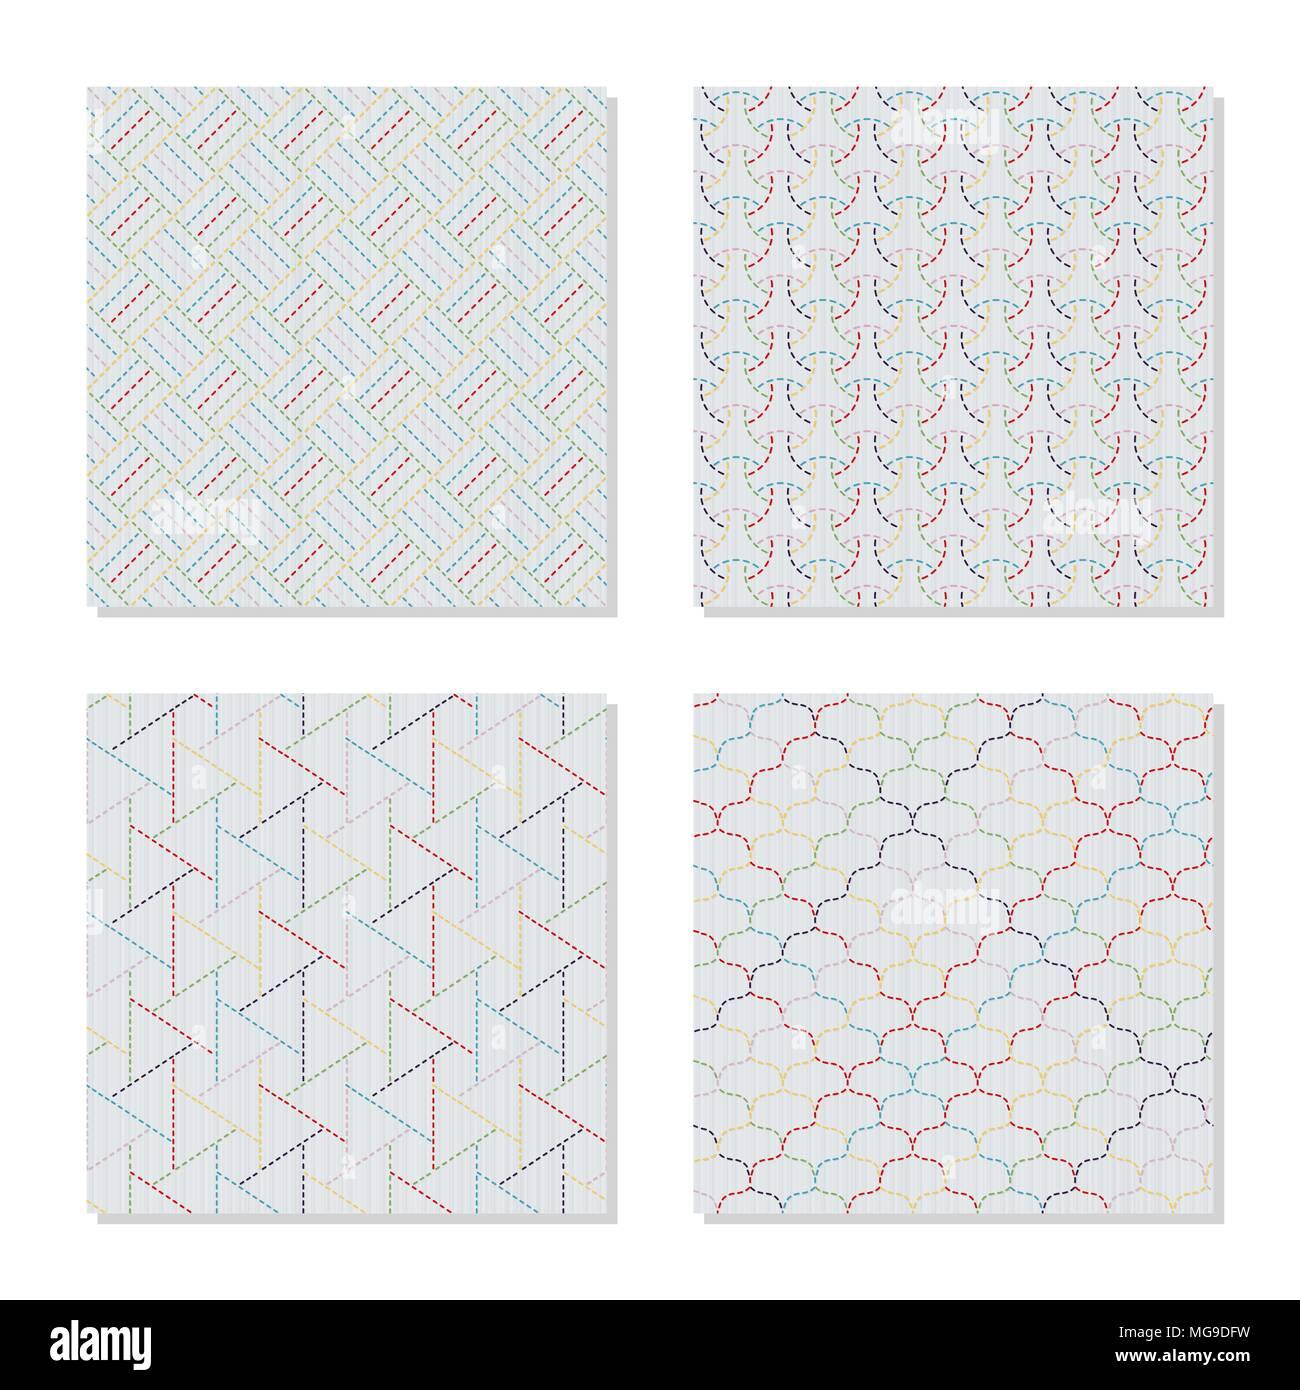 Cuatro motivos bordados de Asia. Adornos sashiko japonés. Serie ...